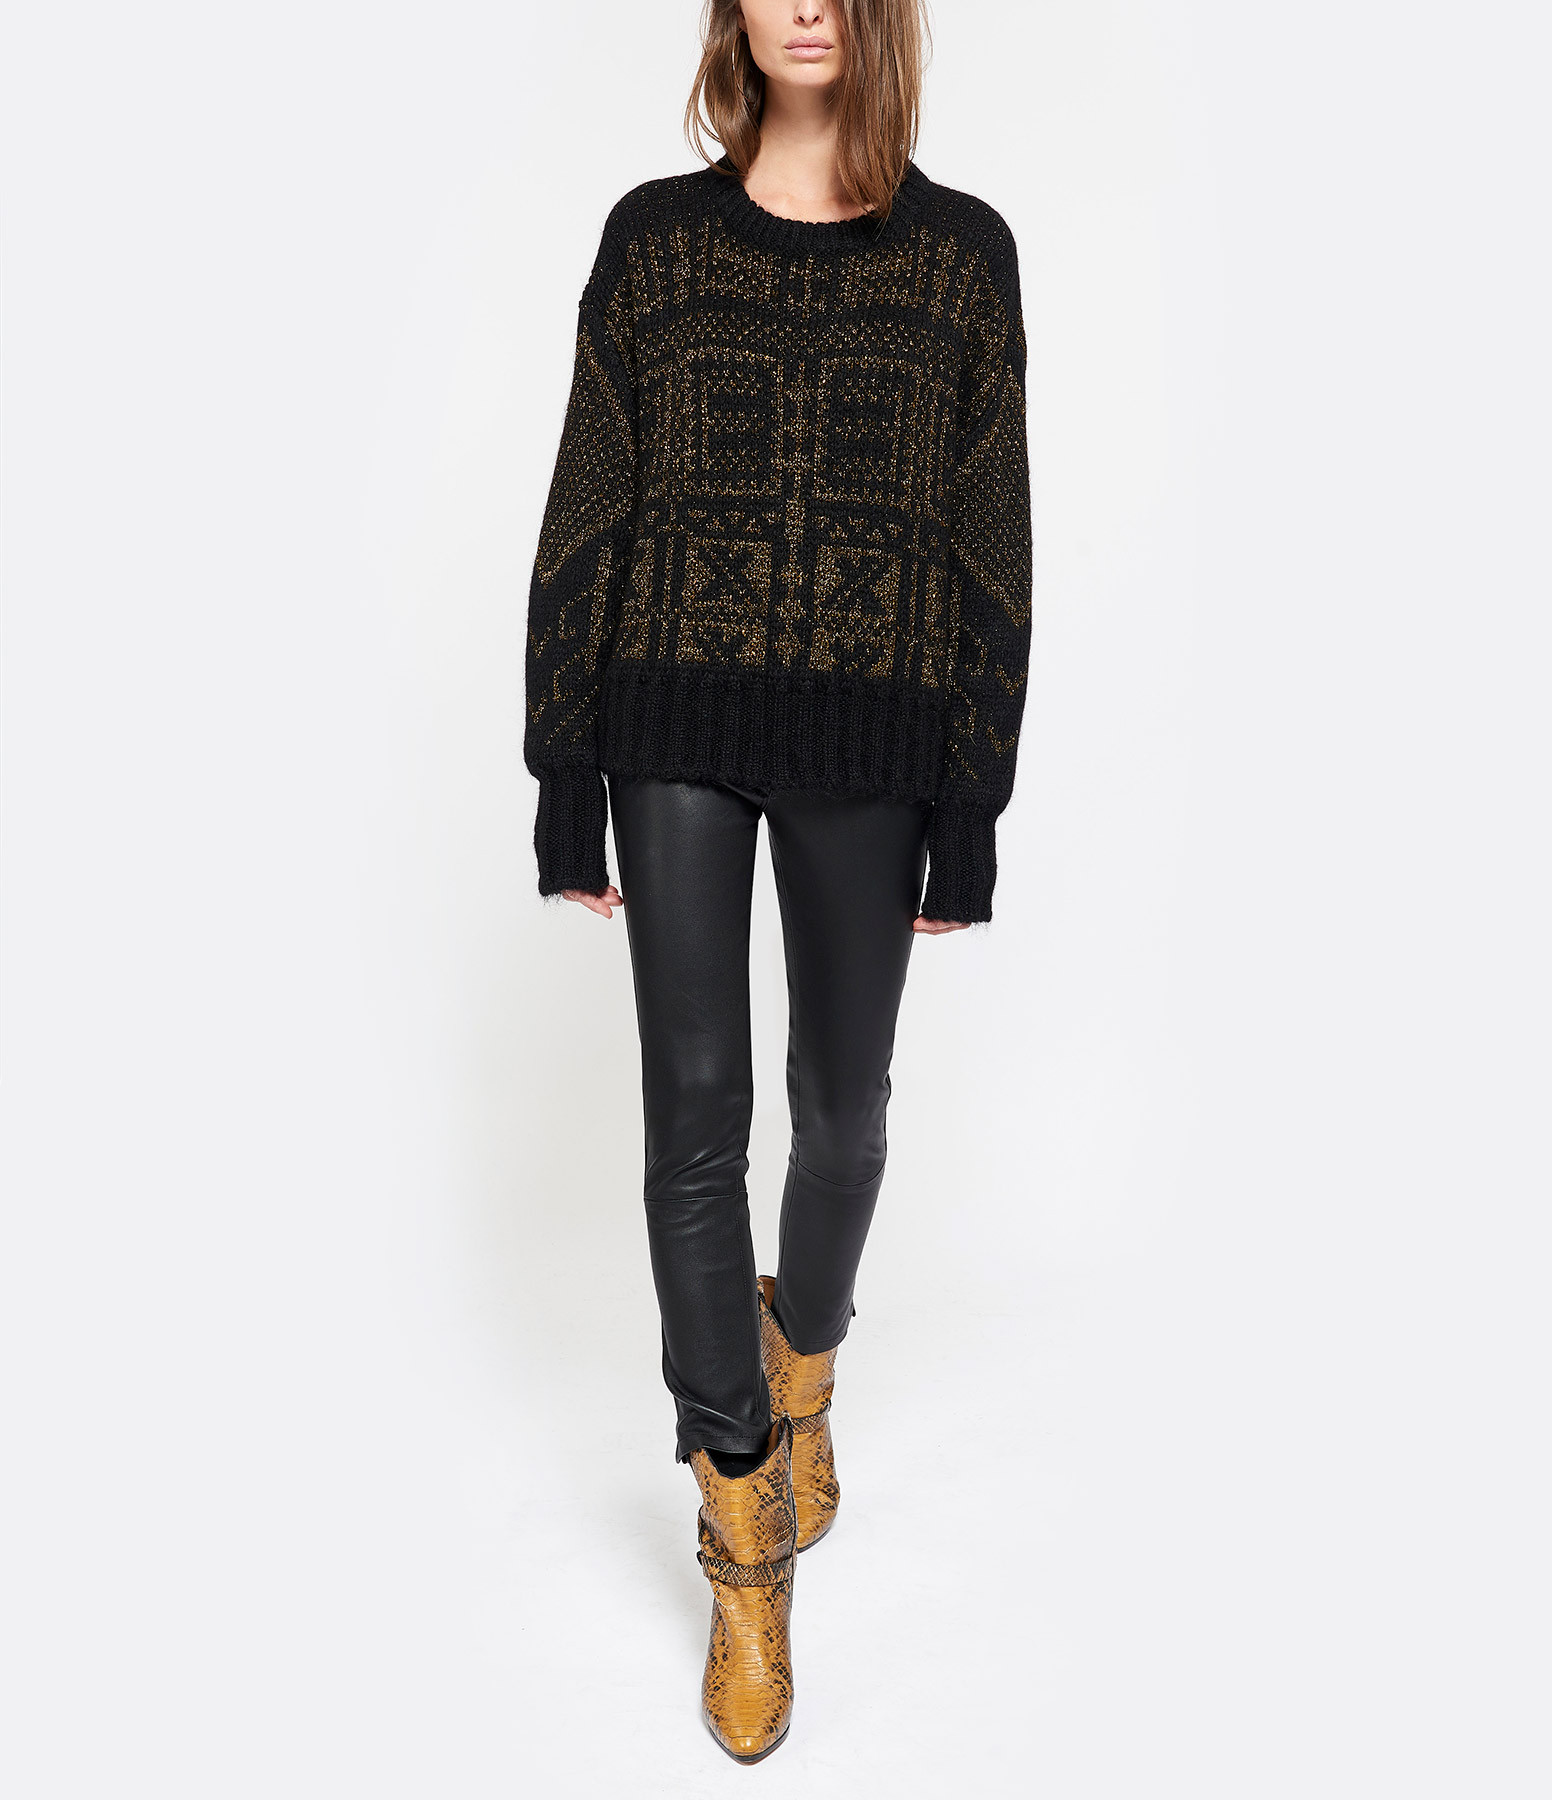 VENTCOUVERT - Pantalon Nine Cuir Agneau Softy Stretch Noir